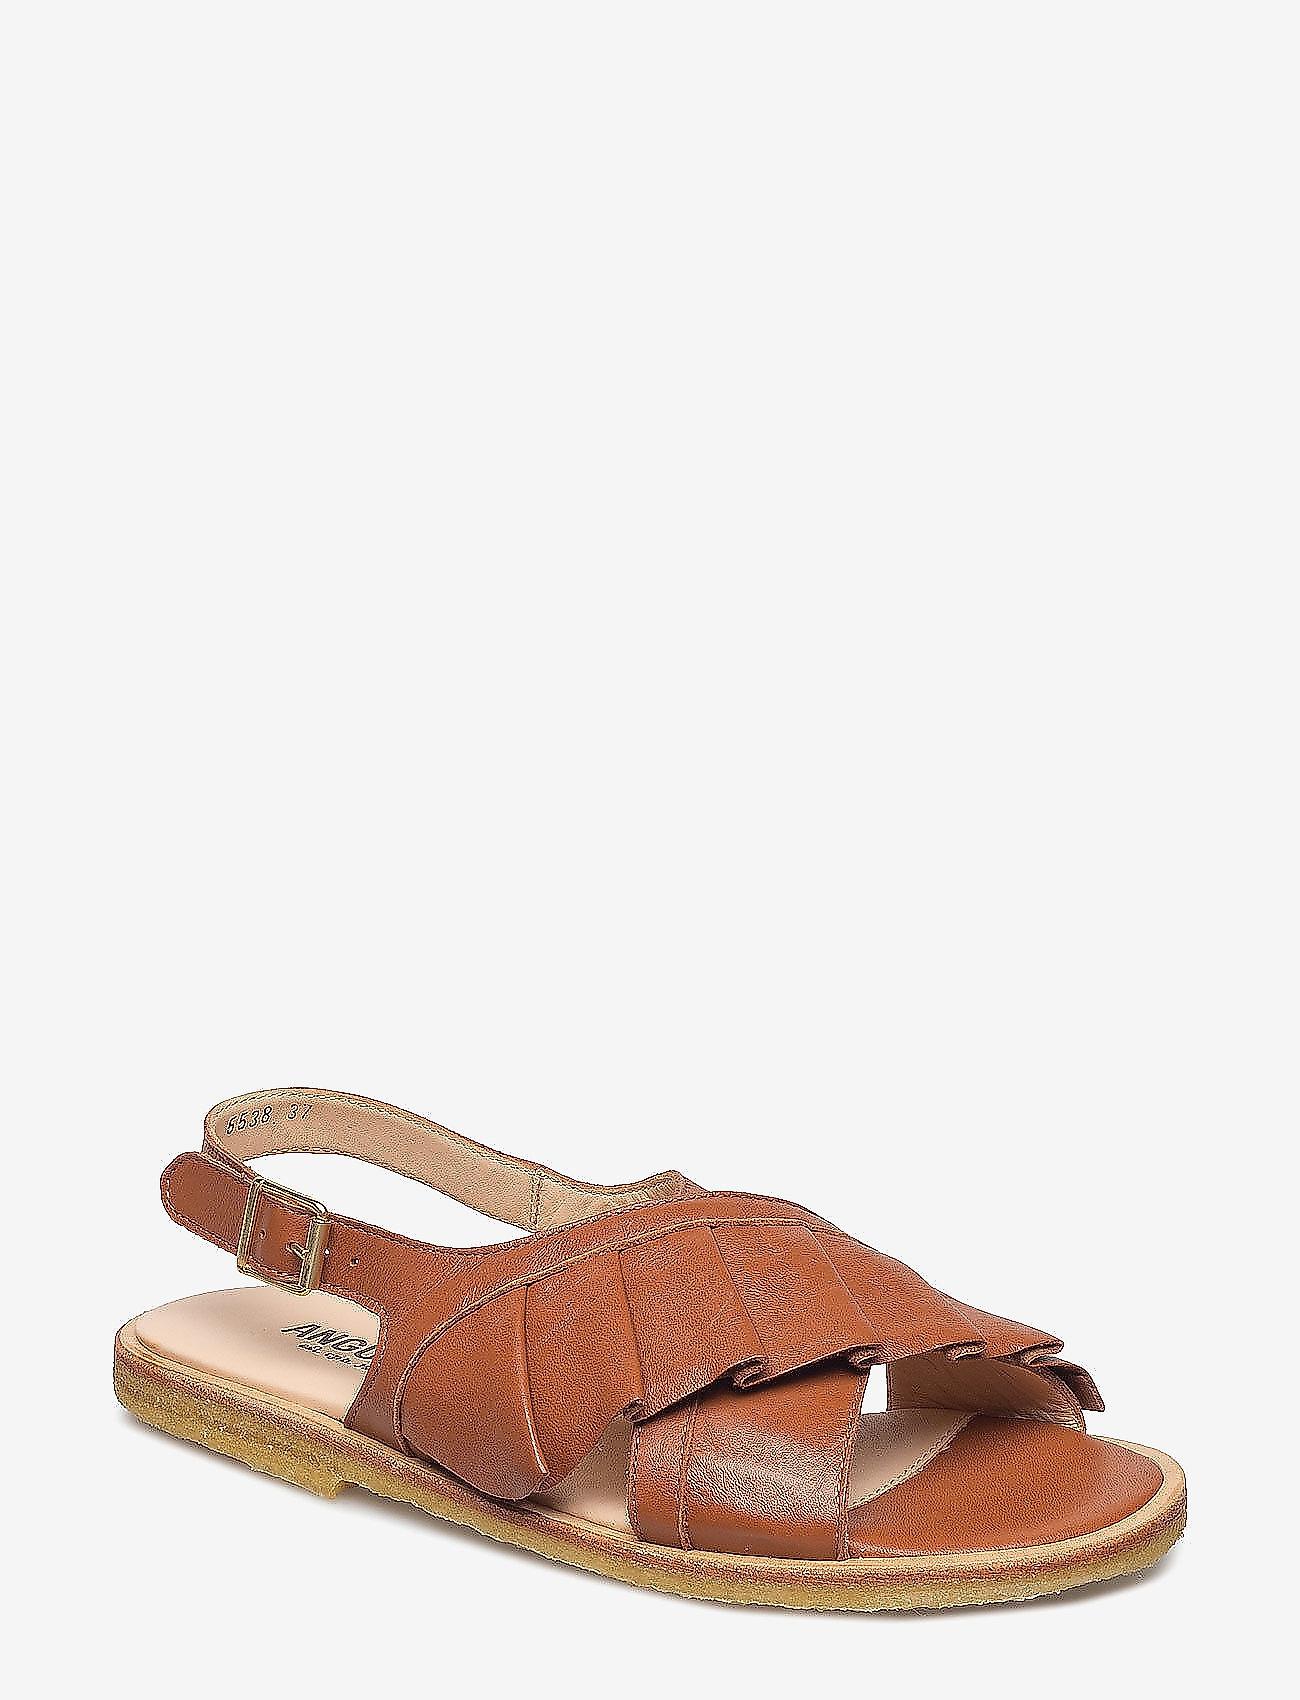 ANGULUS - Sandals - flat - flade sandaler - 1431 cognac - 0